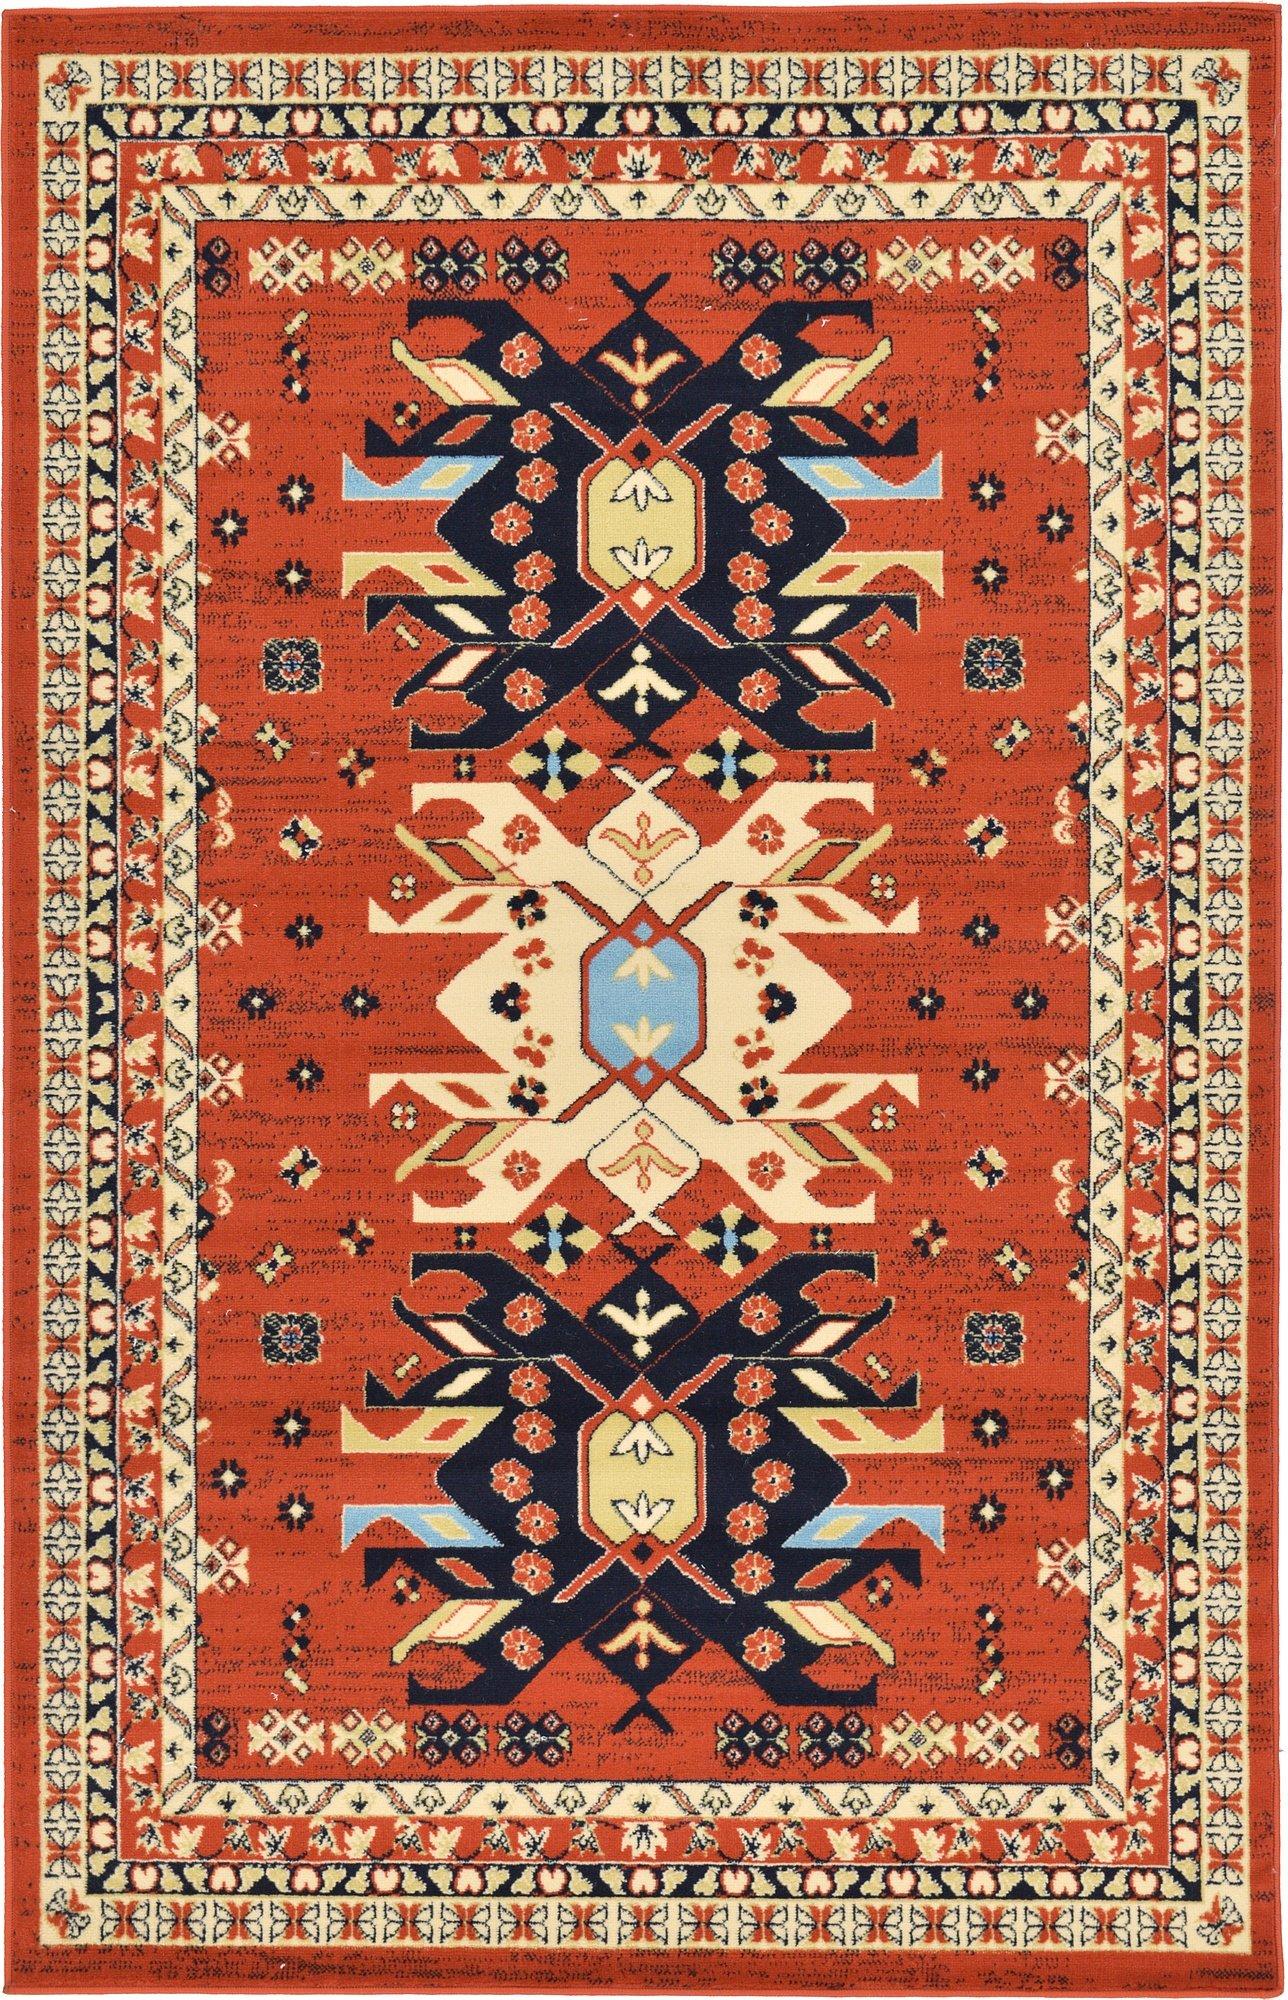 Classic Traditional Geometric Persian Design Area rugs Terracotta 4' 11 x 8' Qashqai Heriz rug